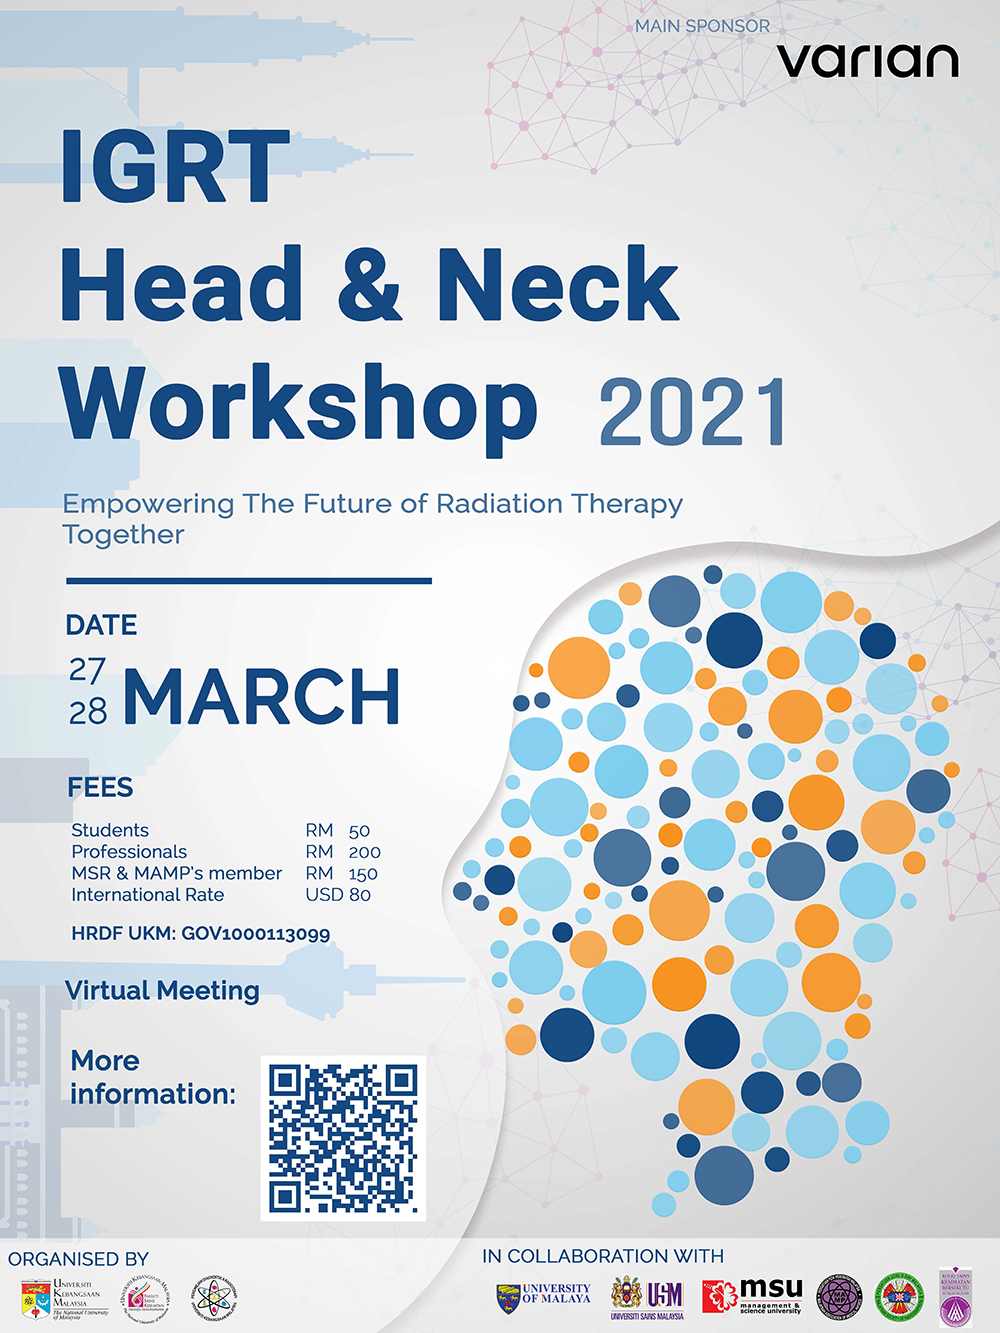 IGRT Head & Neck Workshop 2021